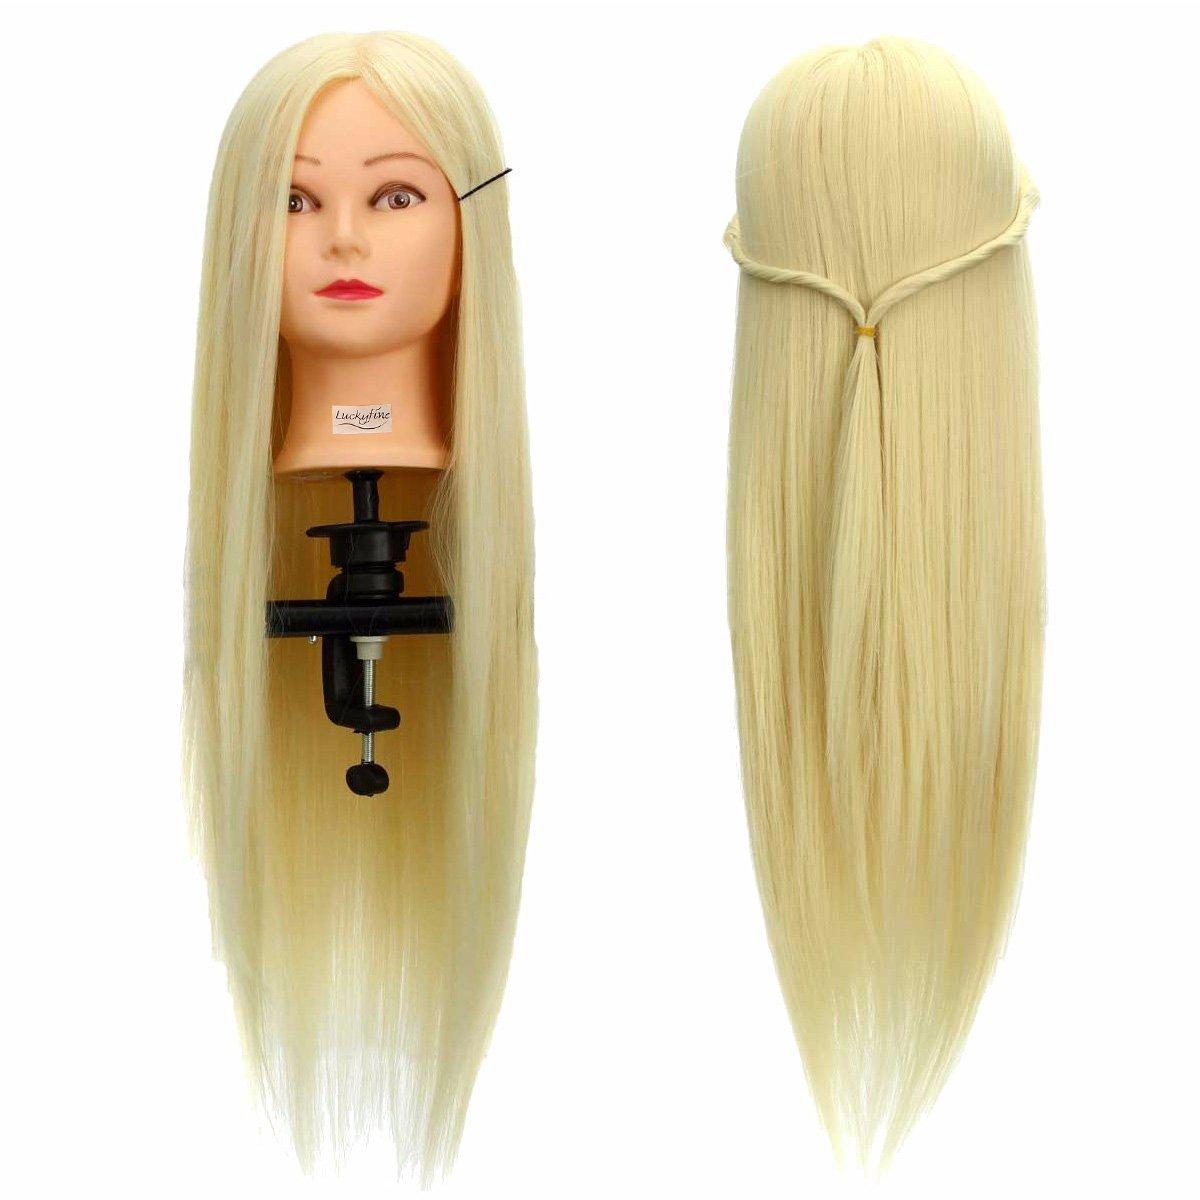 LuckyFine Professionnel 26'' Super Long 30% Cheveux Naturels Coiffure Equipement Mannequin Tête d'exercice Tête à coiffer + Support LUCKYFINEd1ncfKK3O